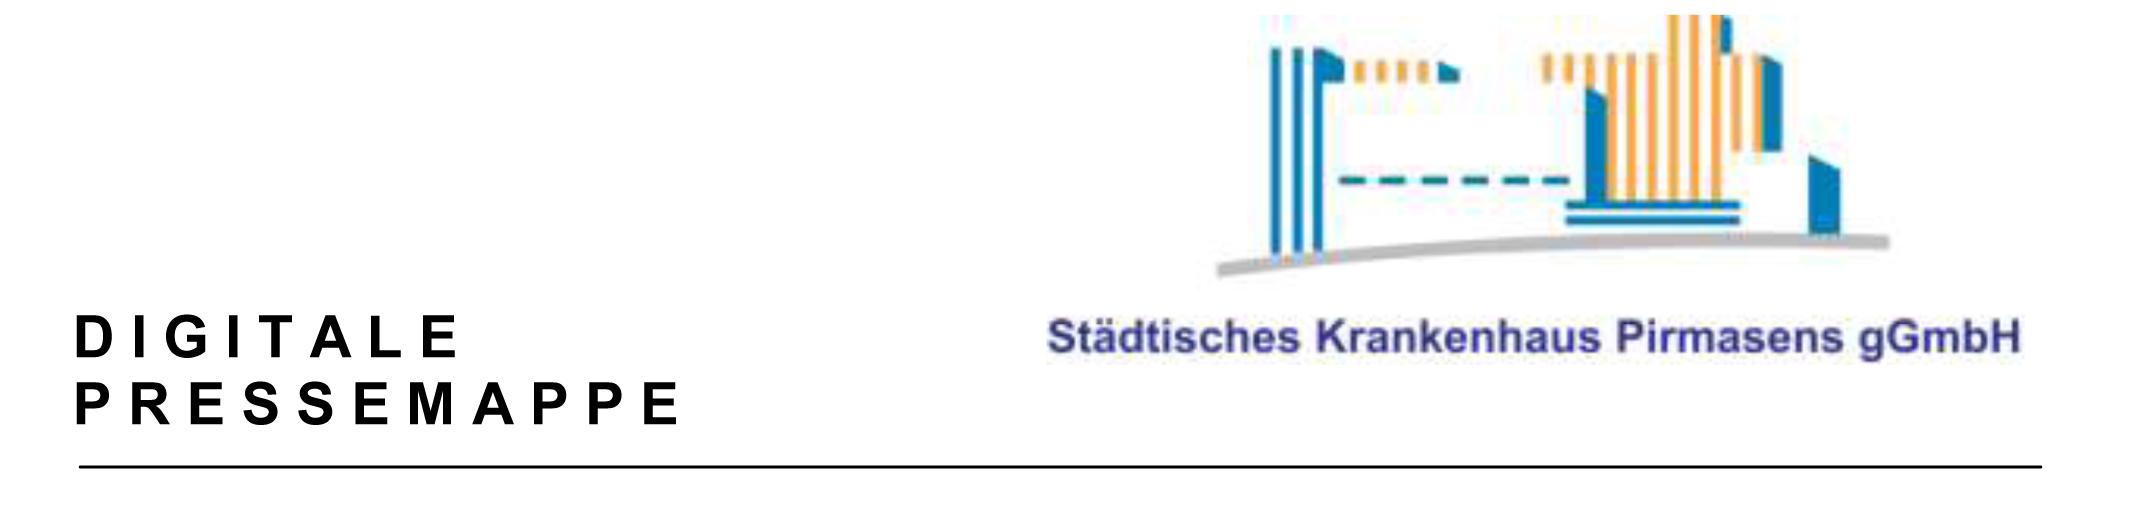 Digitale Presse - MVZ Pirmasens